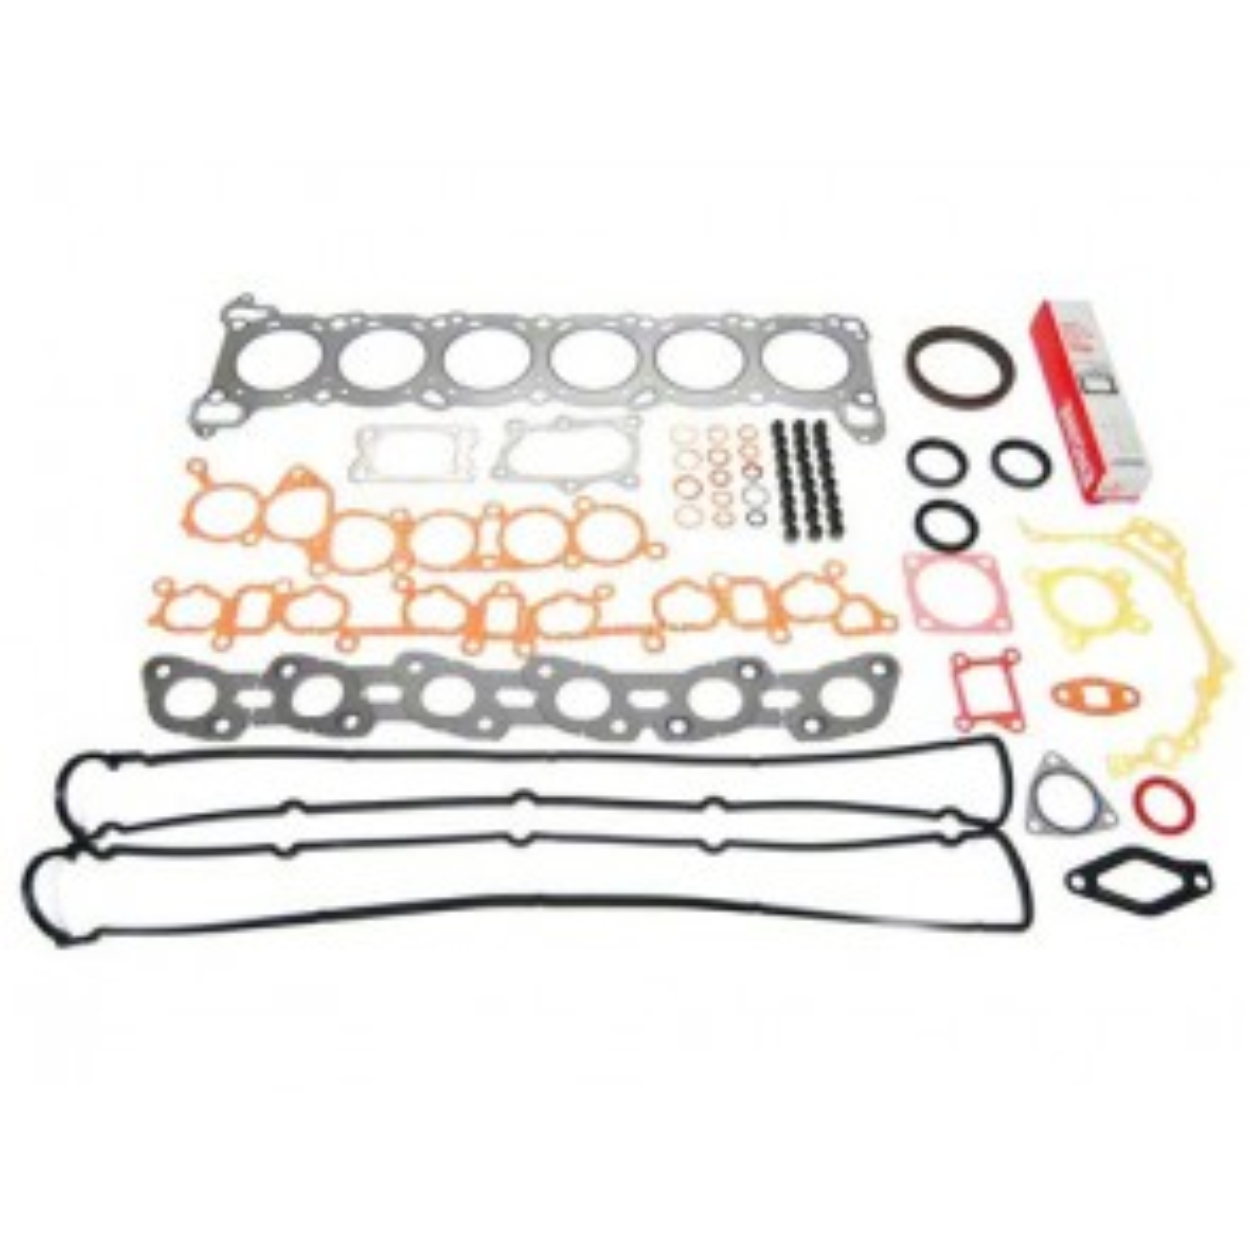 Nissan Genuine OEM Engine Gasket Kit For RB25DET NEO R34 GTT 10101-AA525